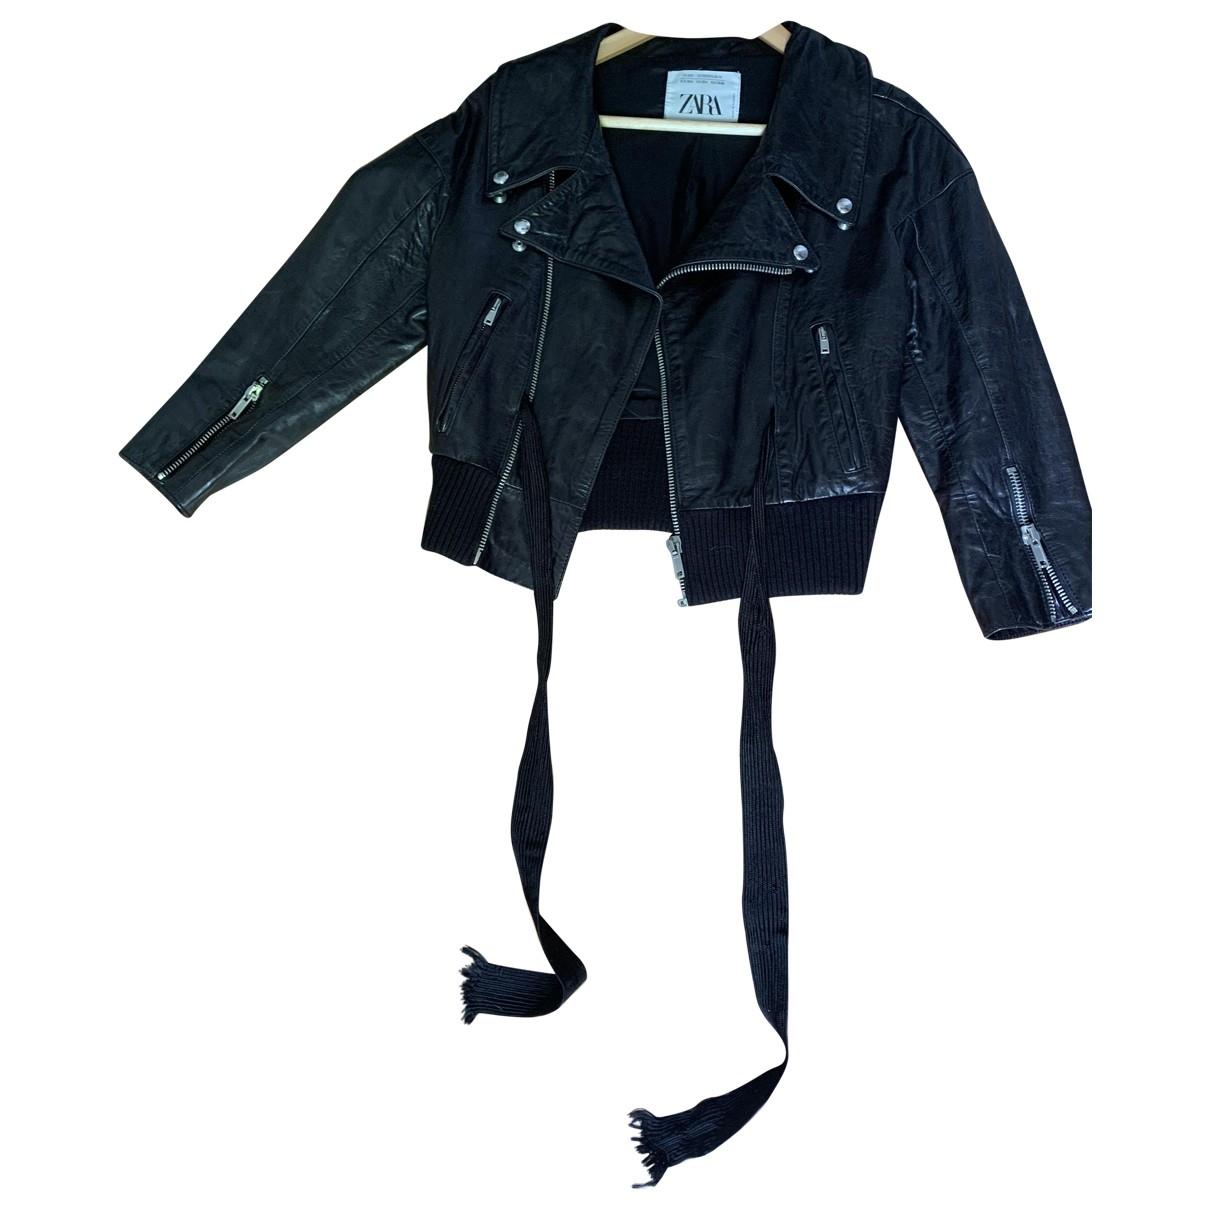 Zara \N Black Leather jacket for Women XS International